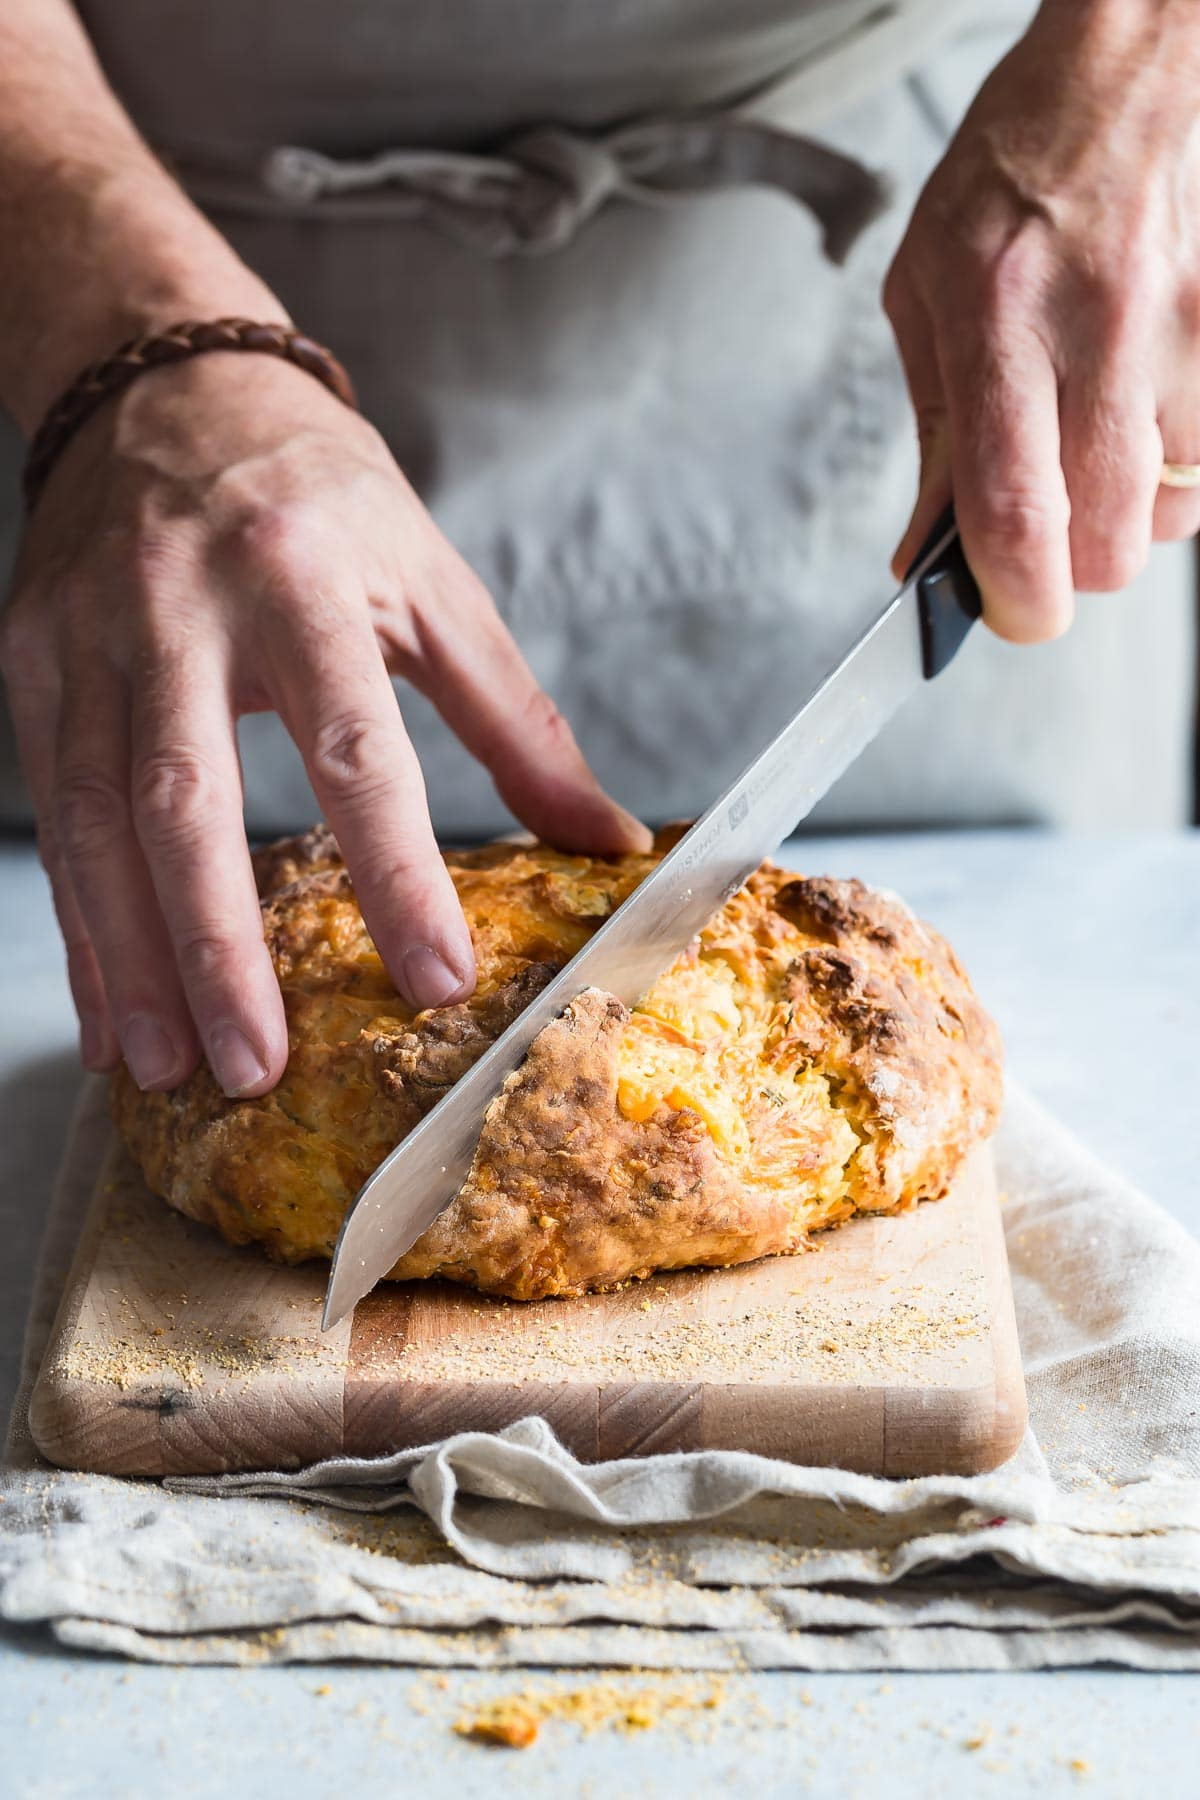 Cutting Irish soda bread into slices